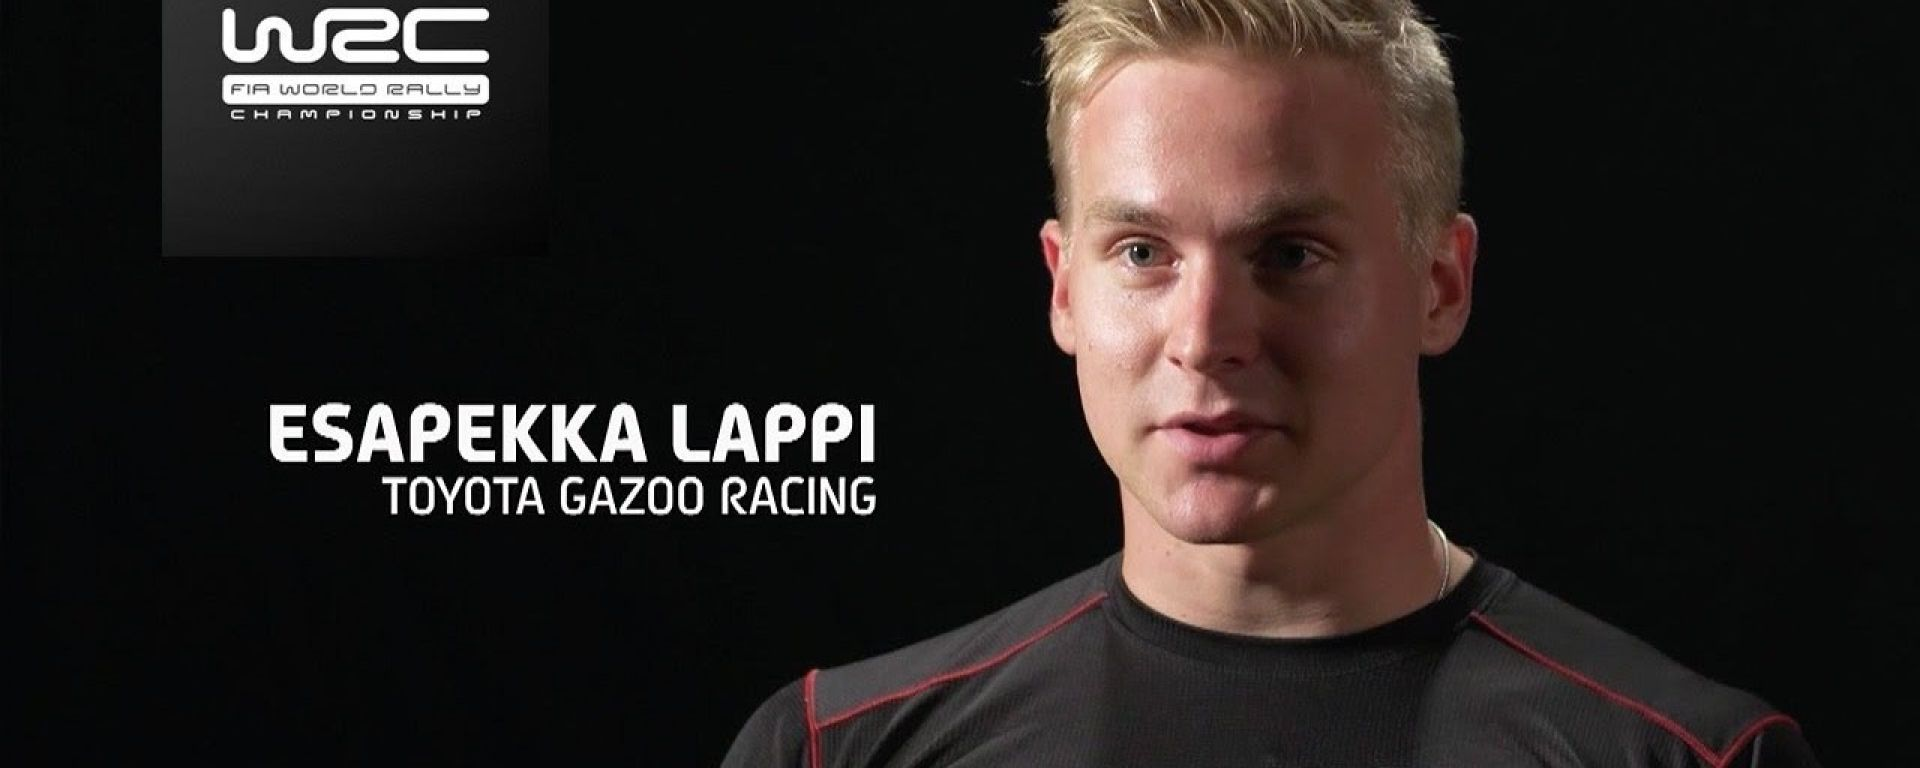 Esapekka Lappi approda in Citroen WRC